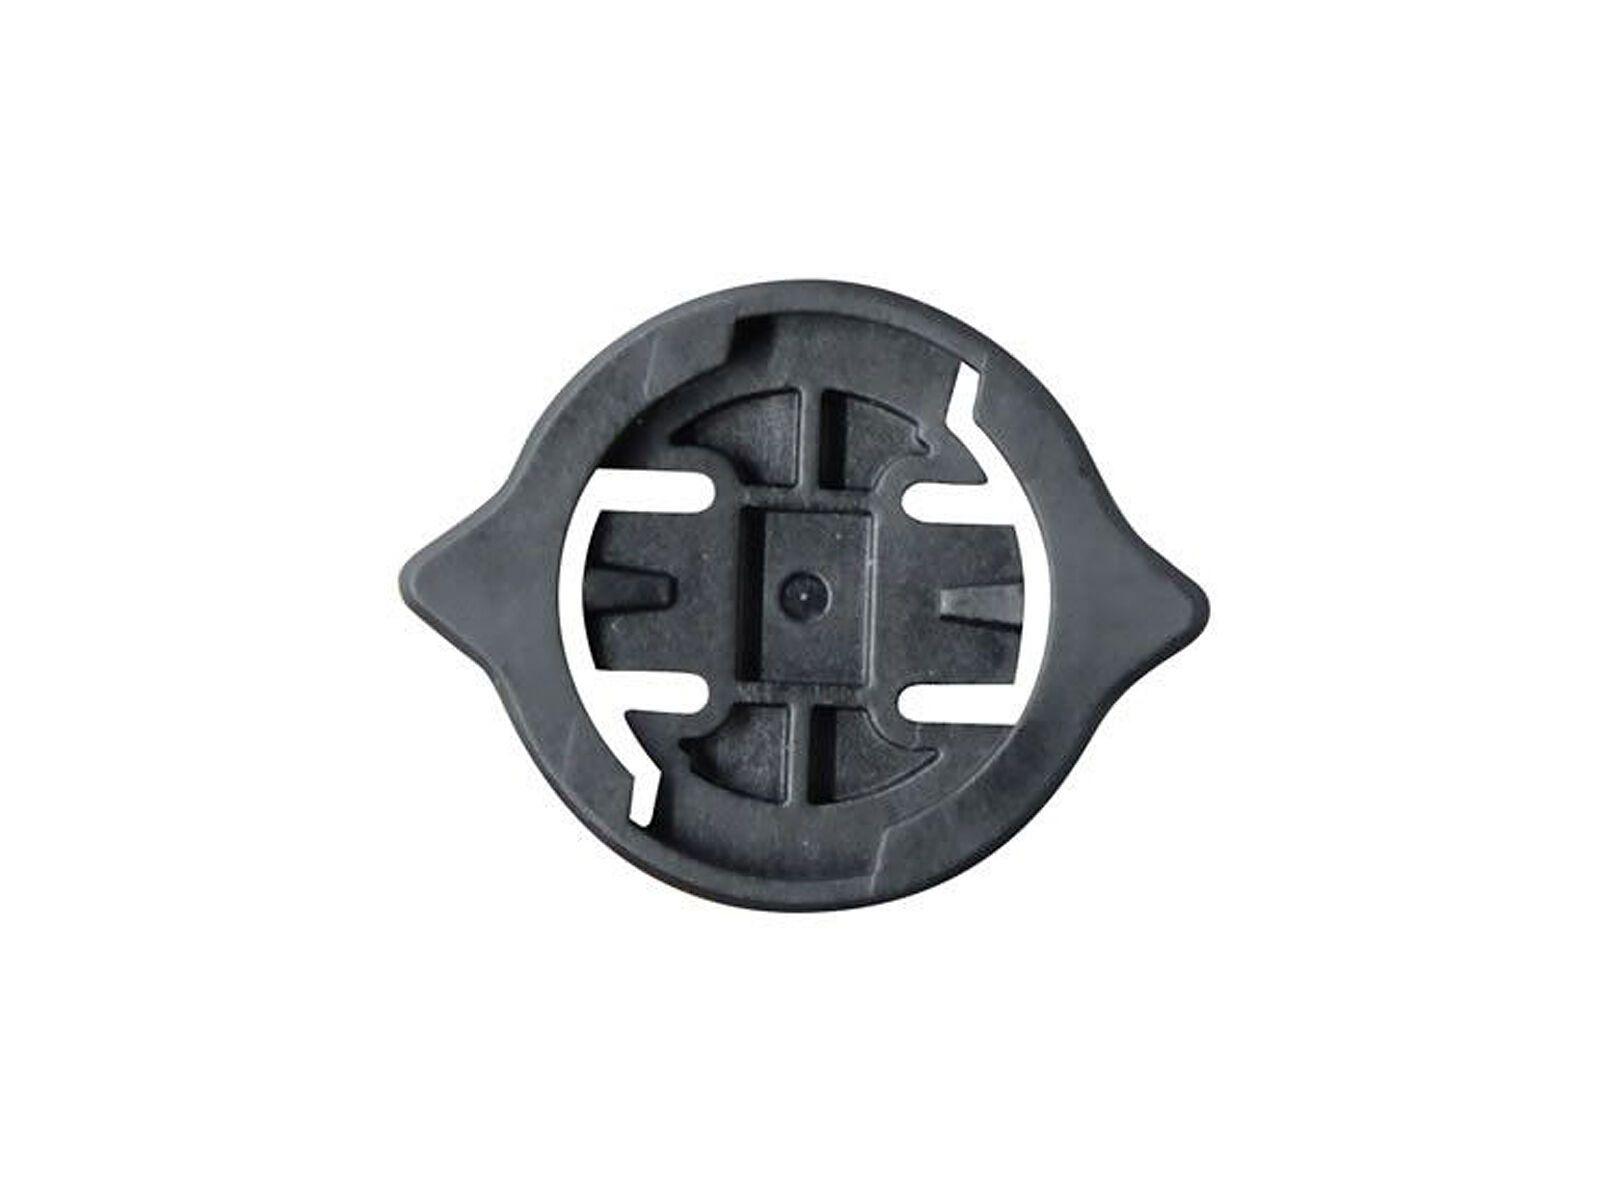 Wahoo Fitness Elemnt Puck-Adapter - Vierteldrehverschluss-Adapter WFCC1M5